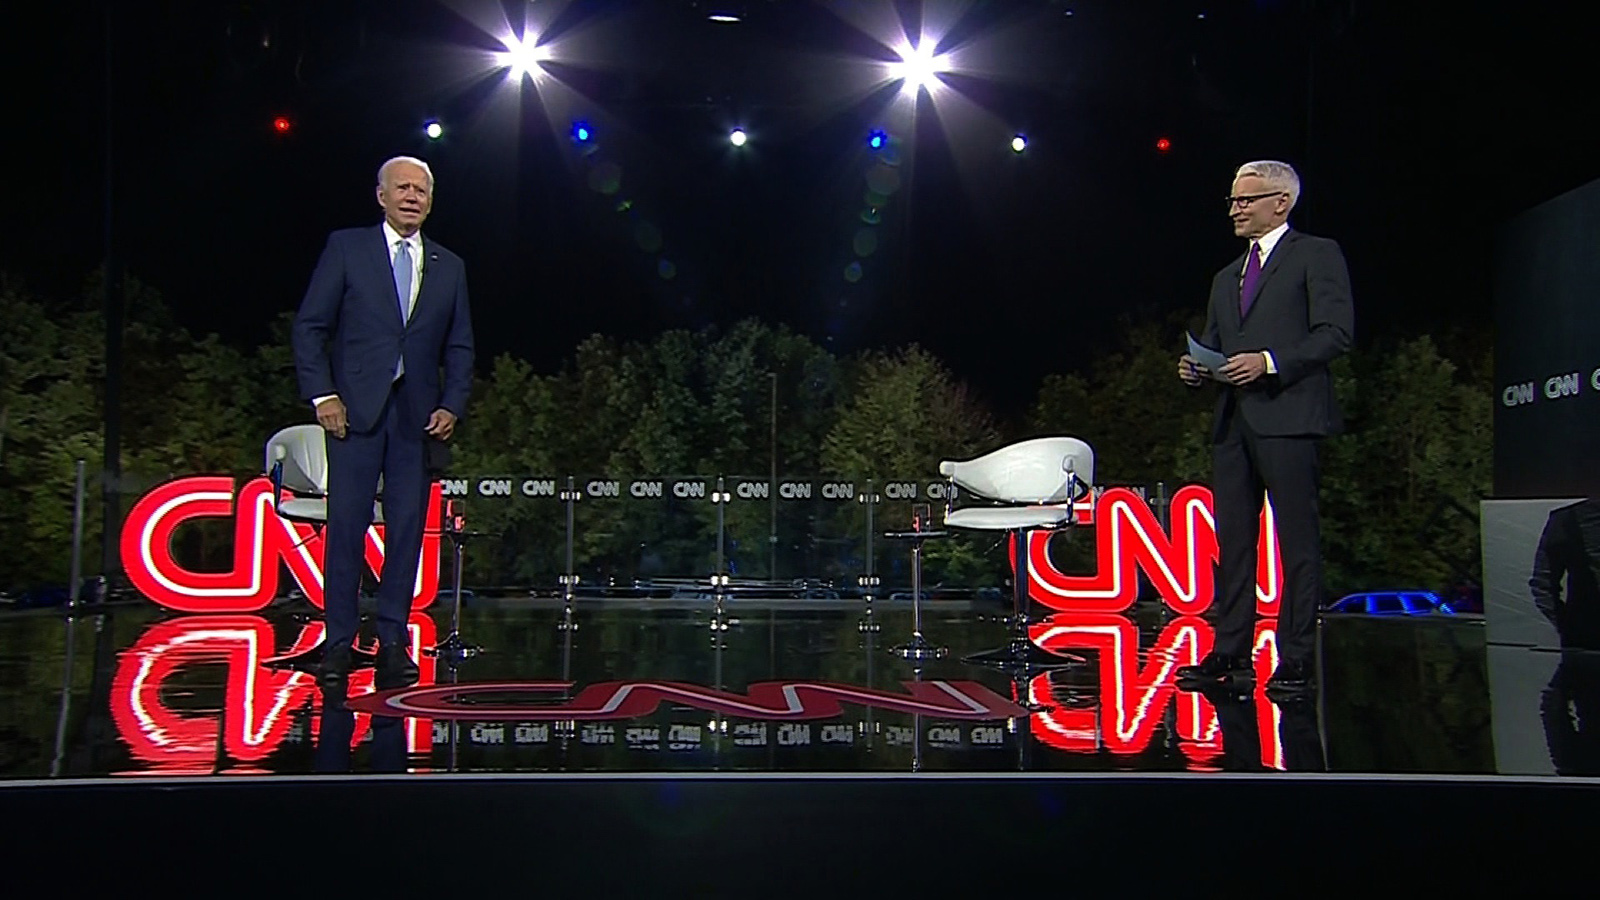 Democratic presidential nominee Joe Biden and CNN's Anderson Cooper speak on stage at the CNN Presidential Town Hall in Scranton, Pennsylvania, on Thursday.